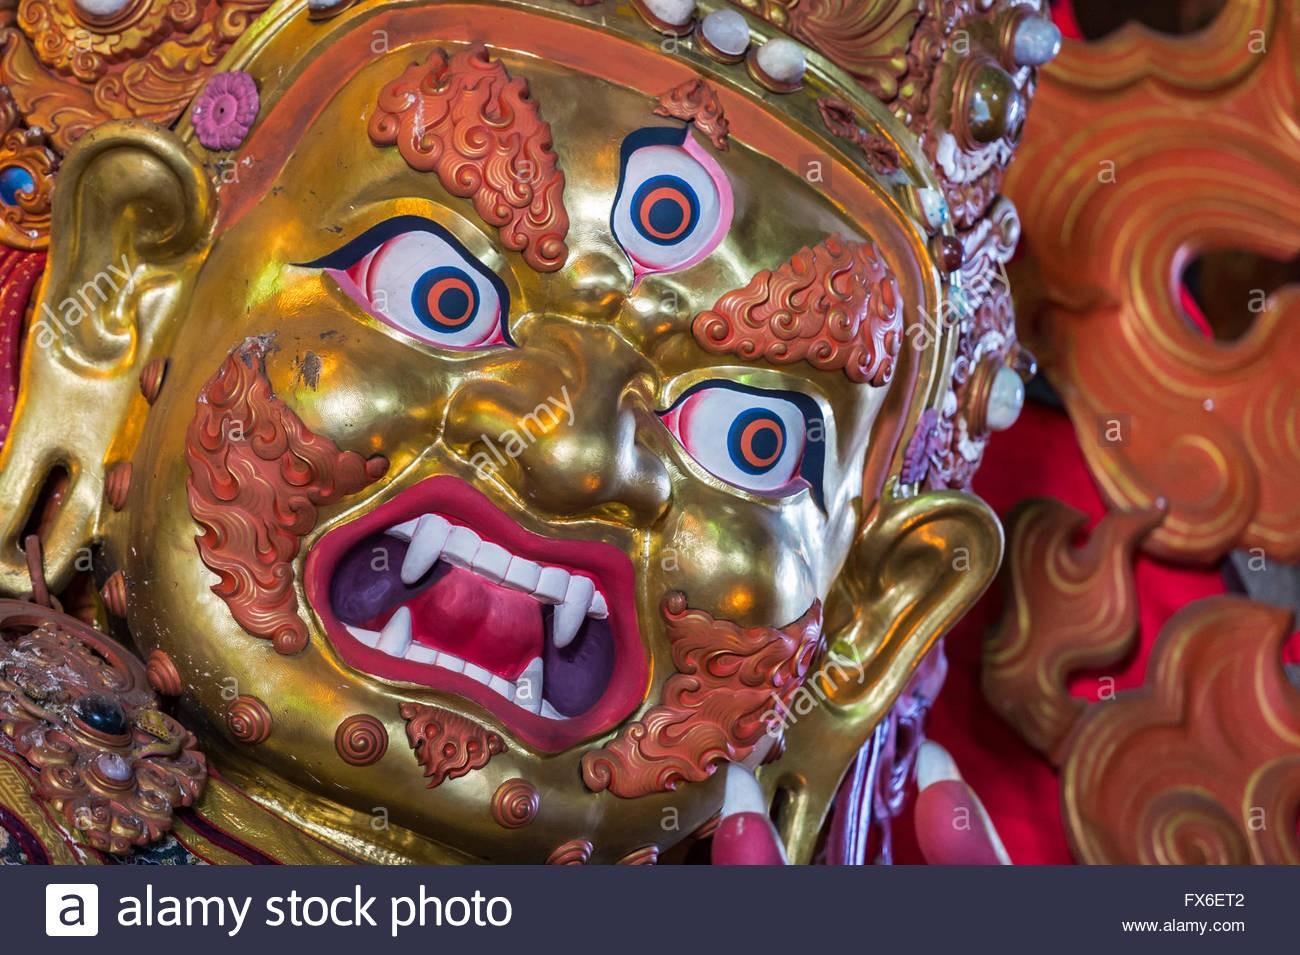 image-of-vajrapani-a-buddhist-deity-fx6et2.jpg